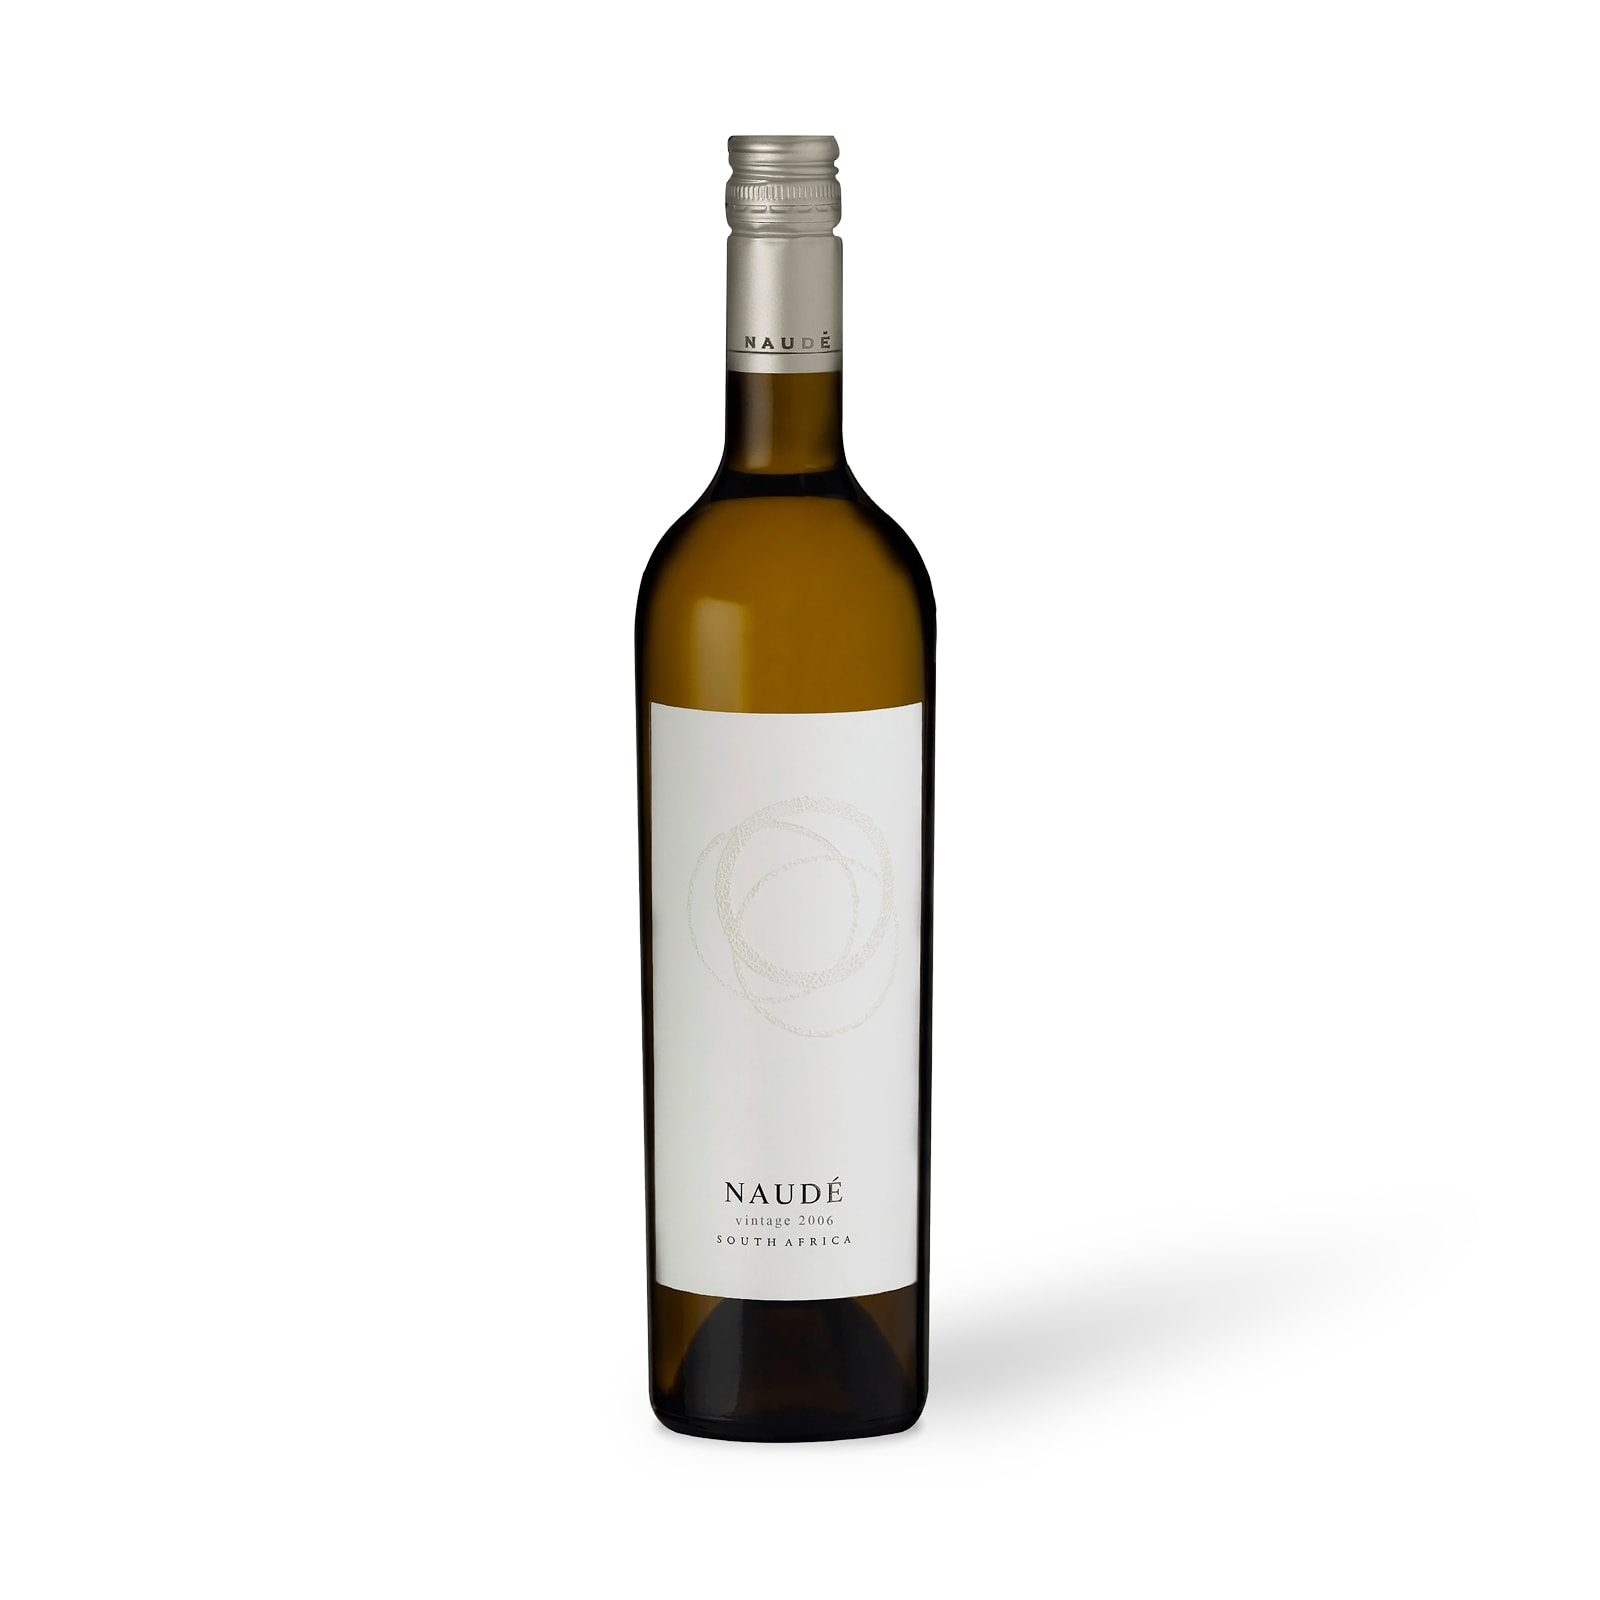 Naudé White Blend 2006 VinoSA